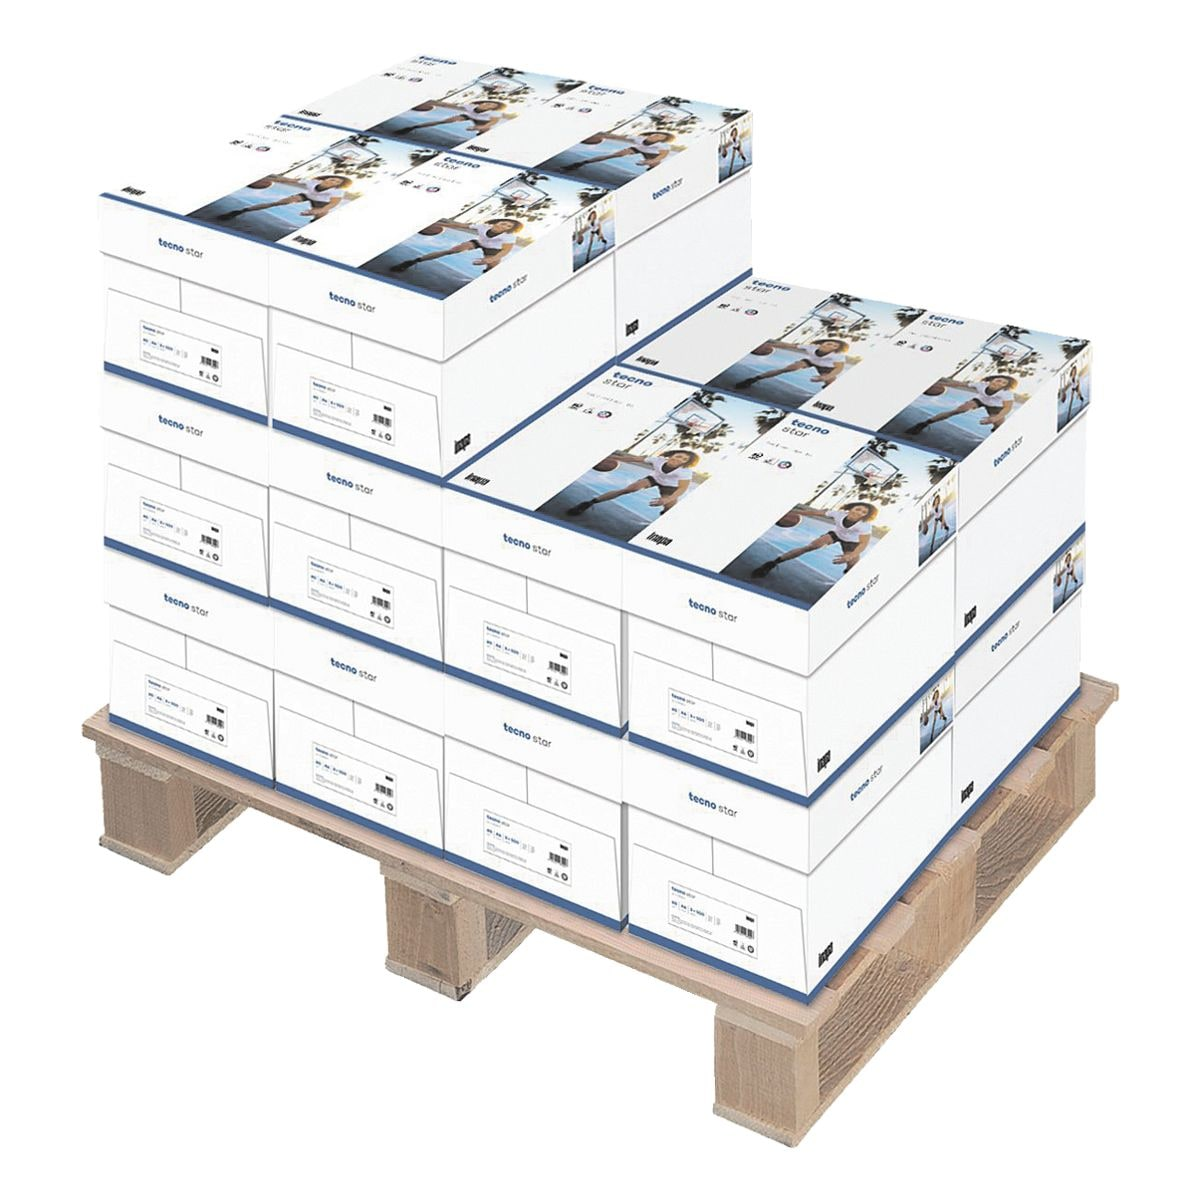 20x Kopierpapier A4 Inapa tecno Star - 50000 Blatt gesamt, 80g/qm